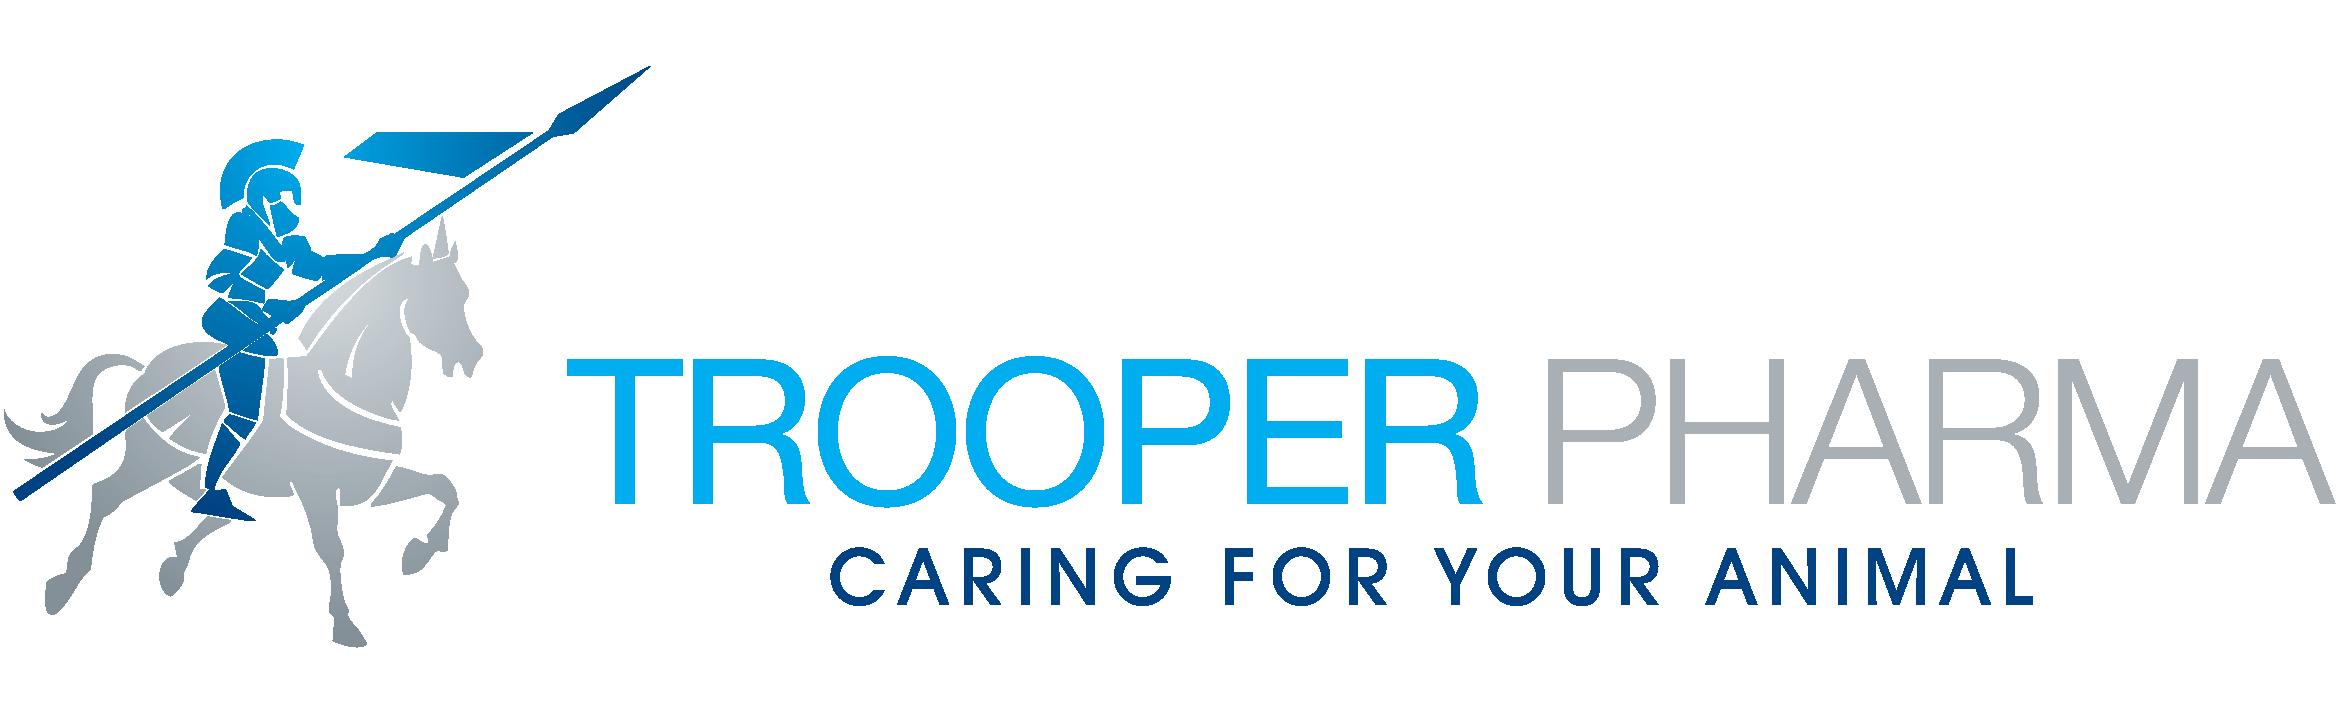 Trooper Pharma Group